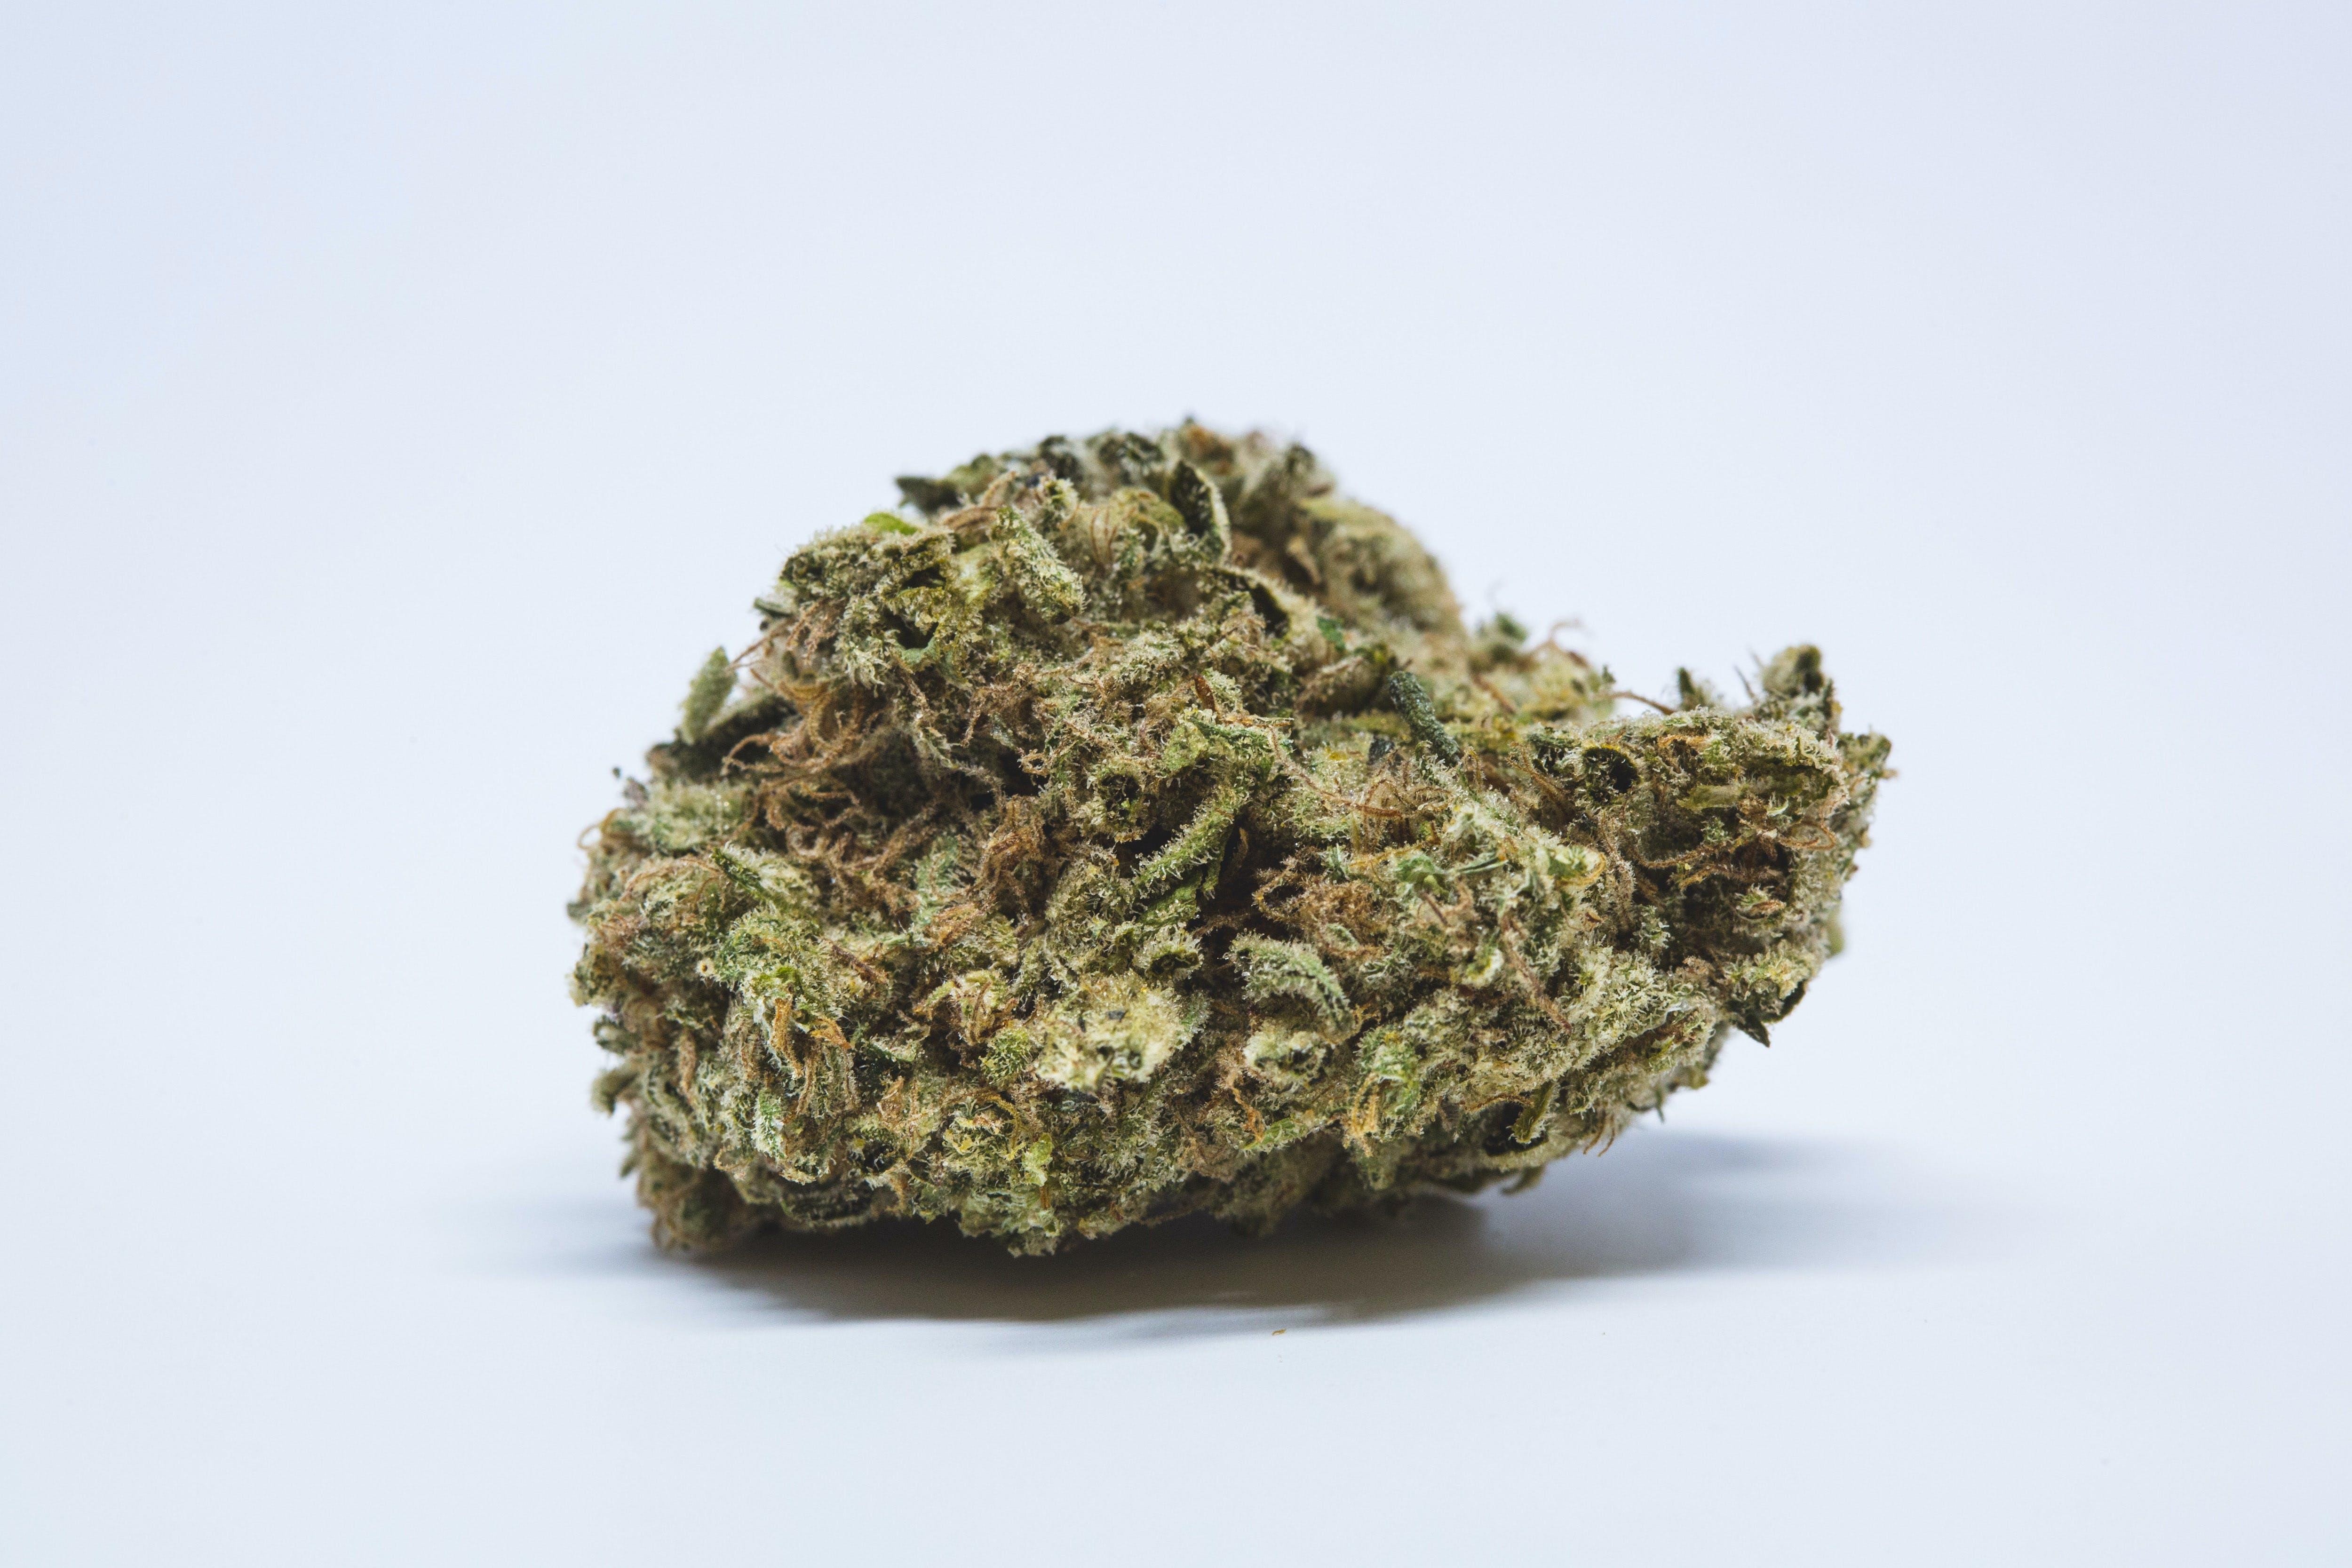 Lemon Haze Weed; Lemon Haze Cannabis Strain; Lemon Haze Sativa Marijuana Strain